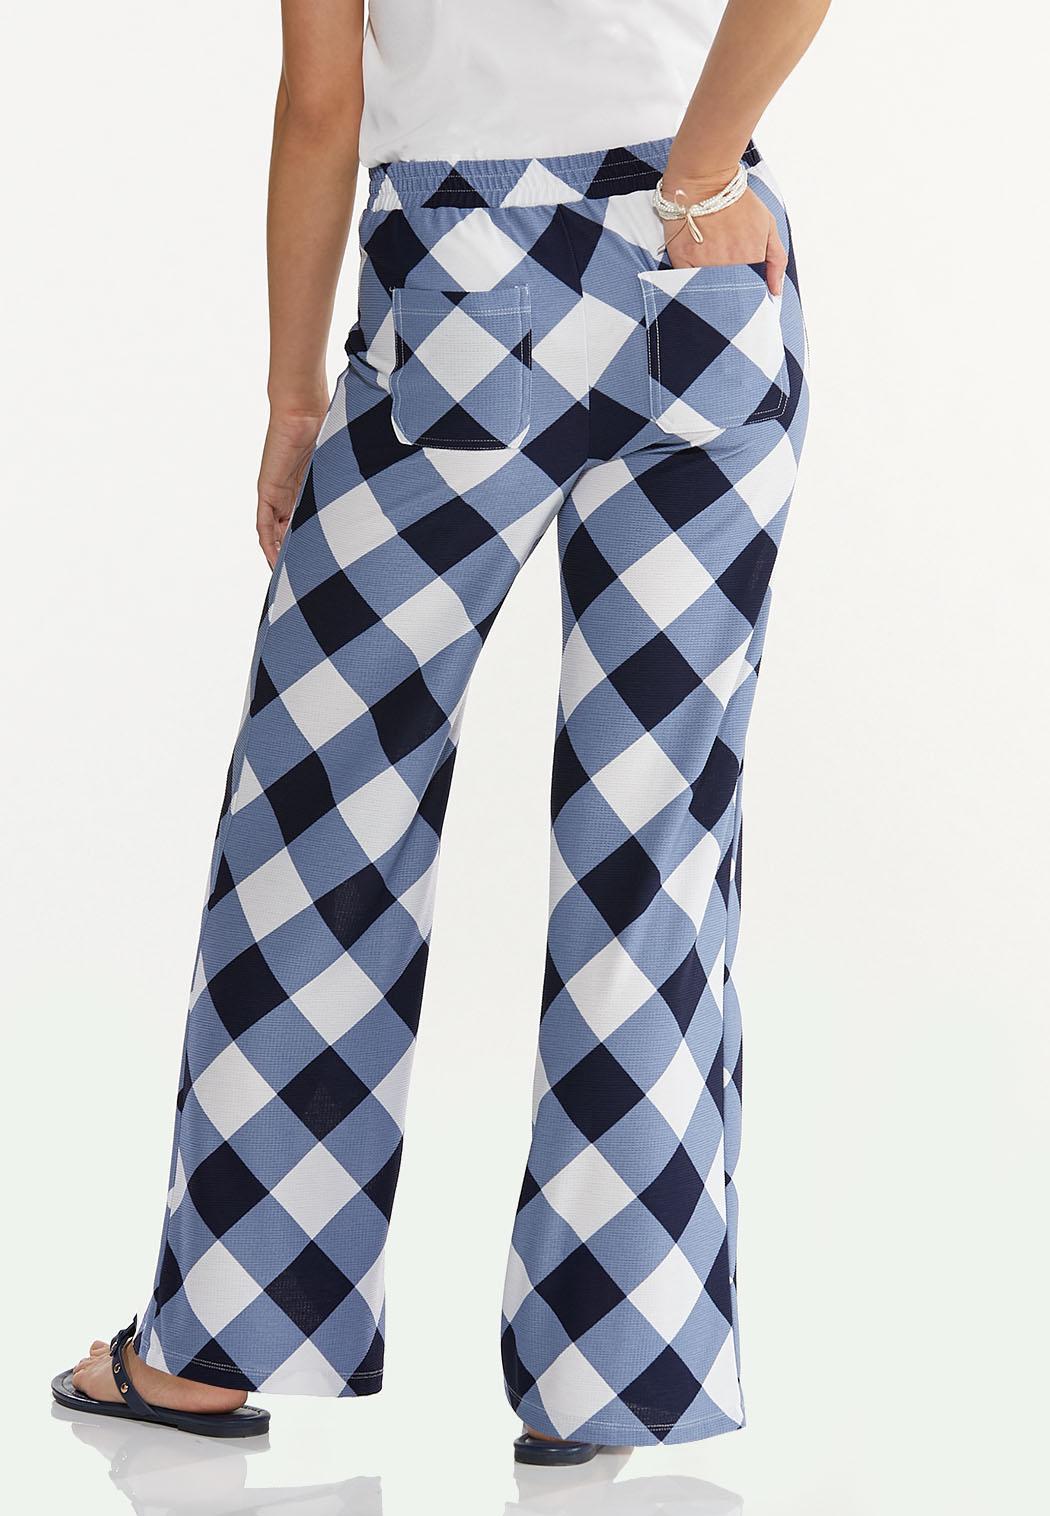 Navy Gingham Pants (Item #44610596)